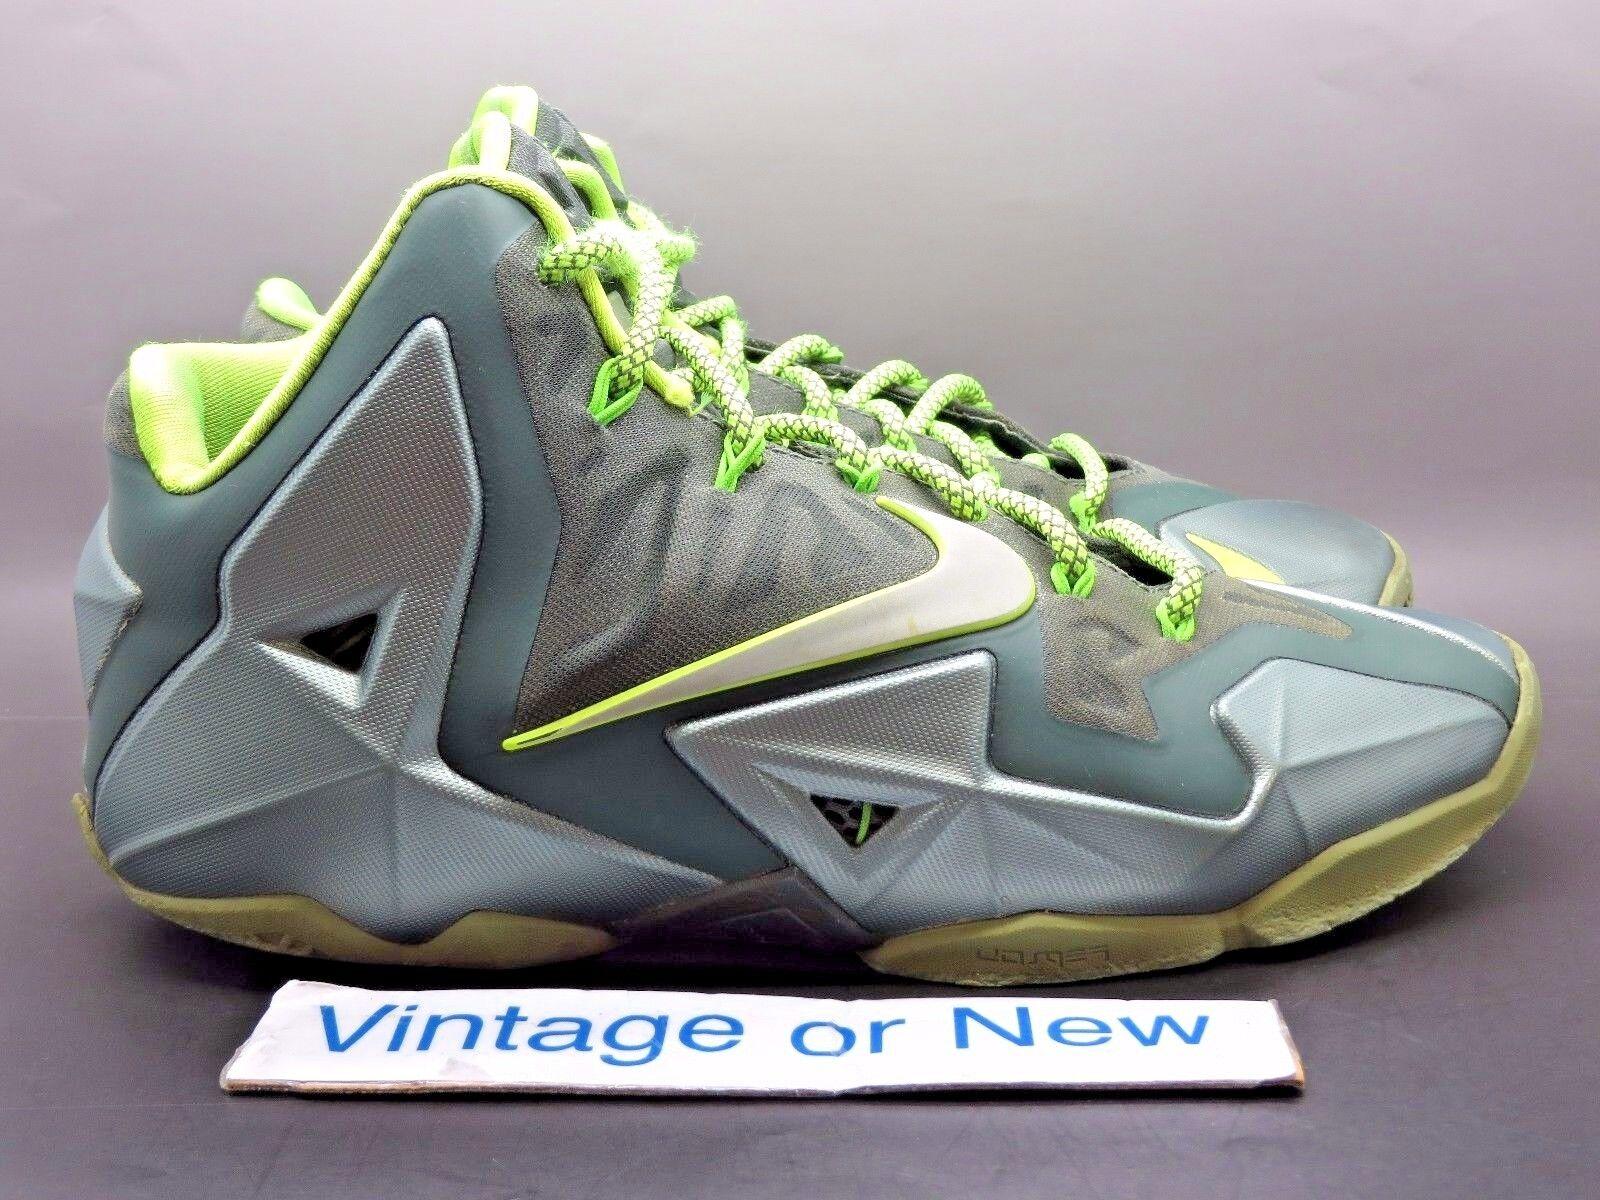 53fbc264bc5 Nike LeBron LeBron LeBron XI 11 Dunkman sz 8.5 c6c17f - work.hilltop ...